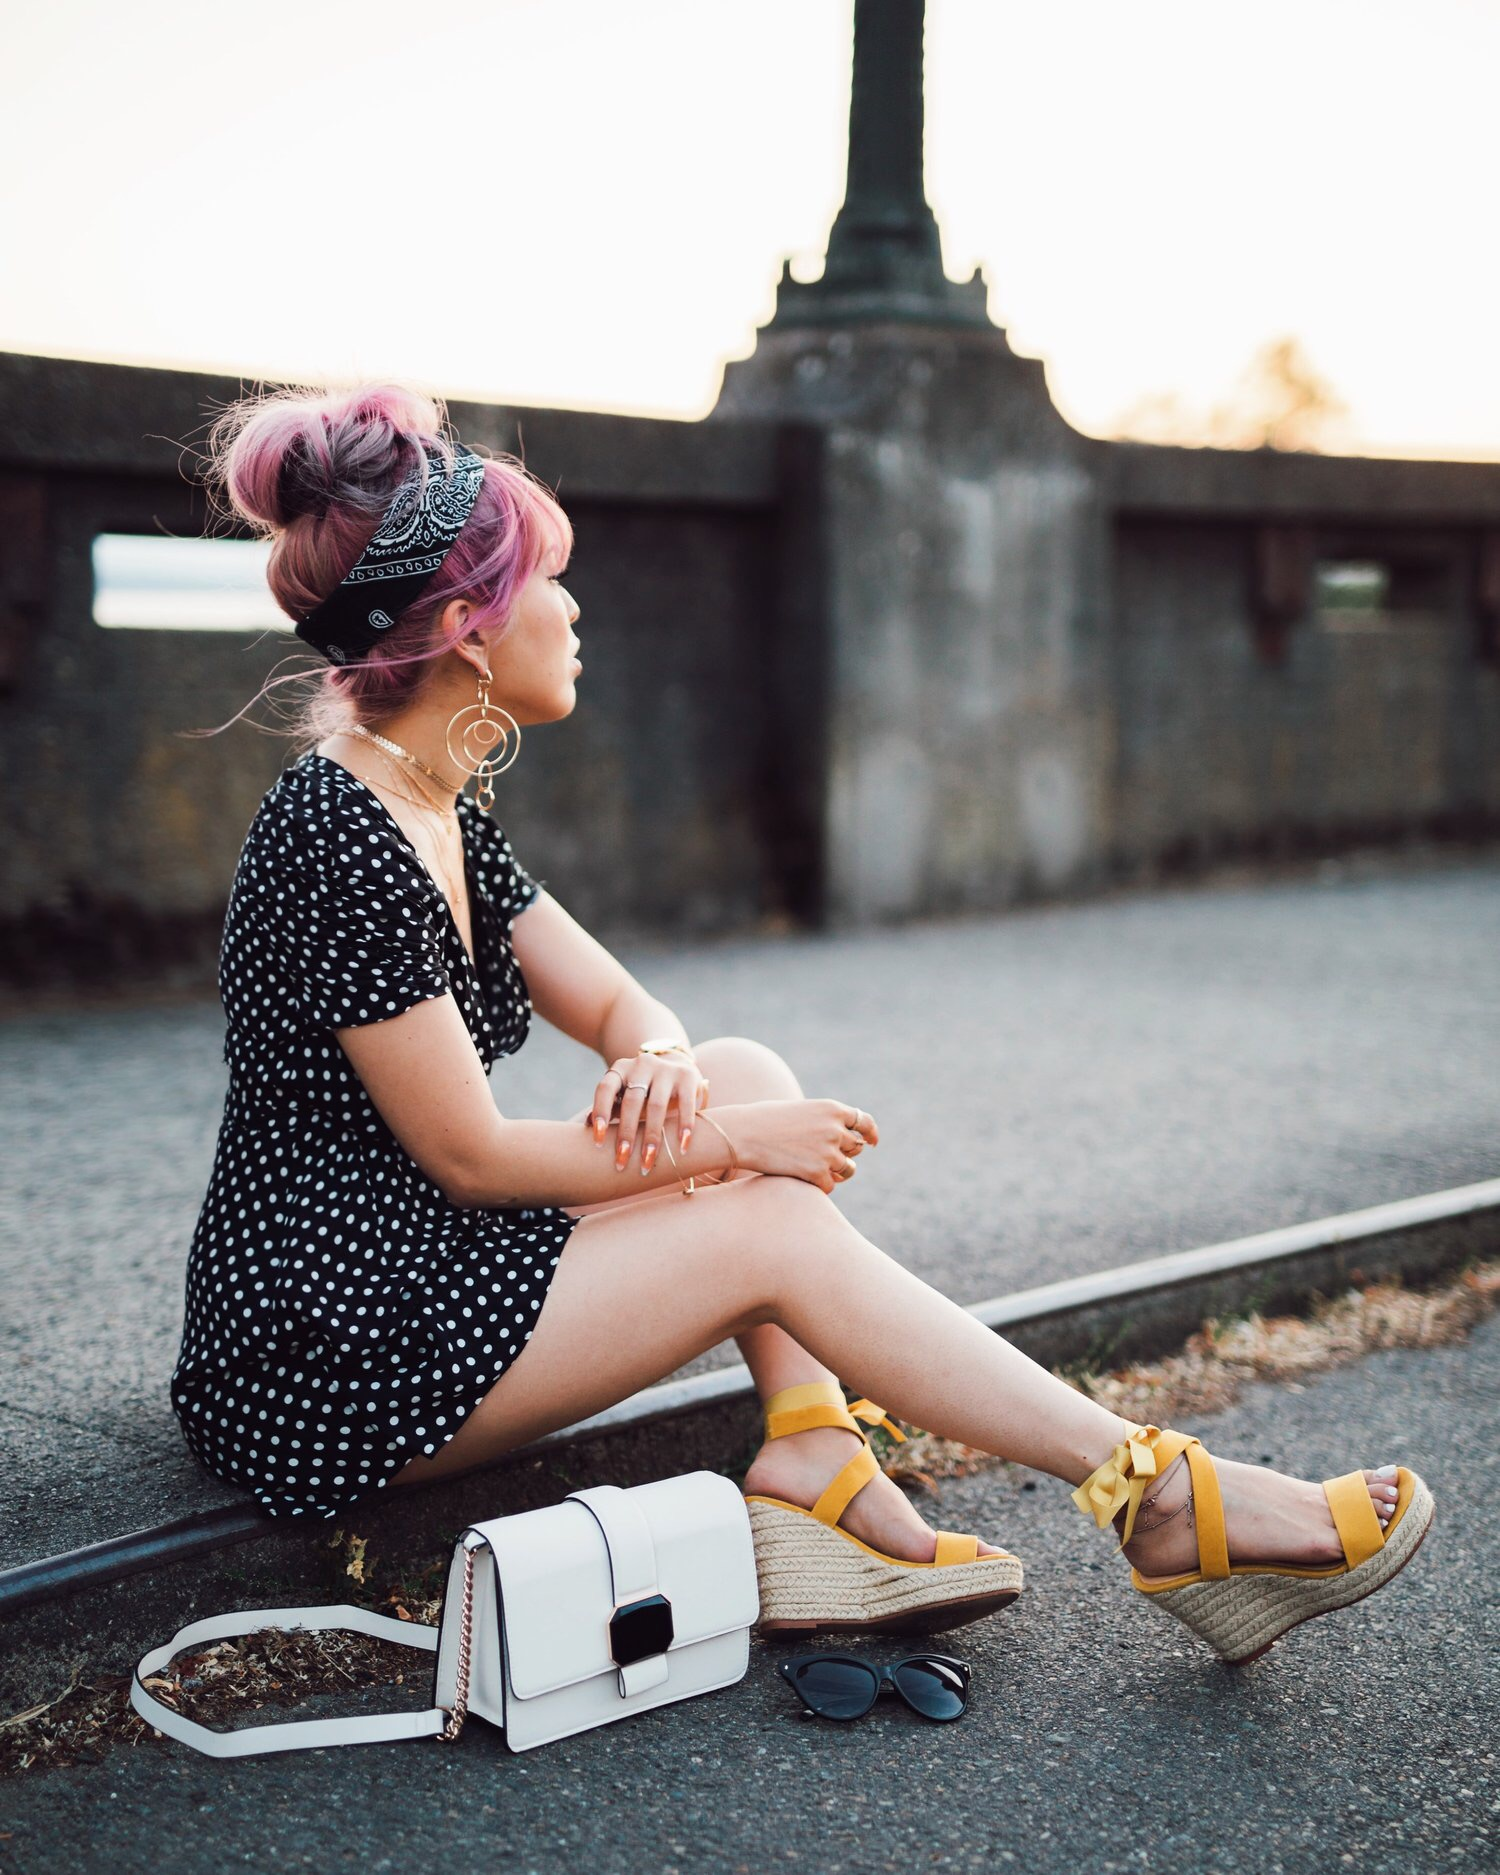 e034583f8b3 Easy Chic Summer Look  Polkadot Romper Under  60 — AikA s Love♥ Closet